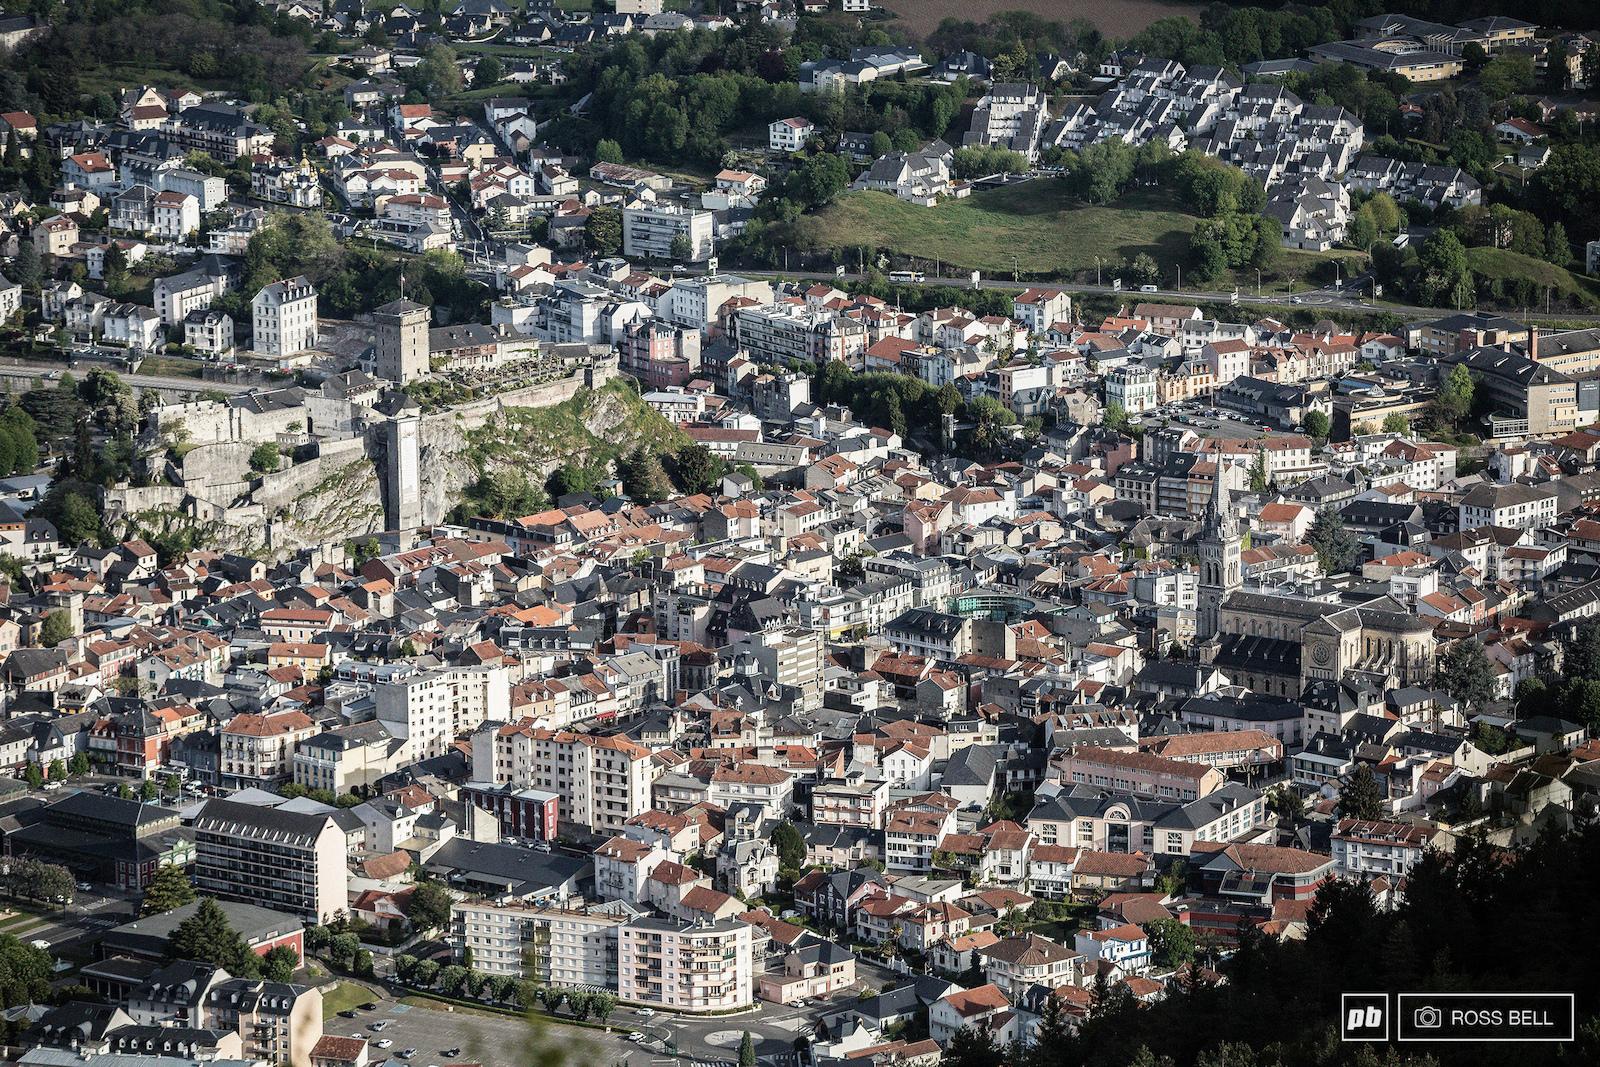 The chateau dominates the Lourdes skyline.